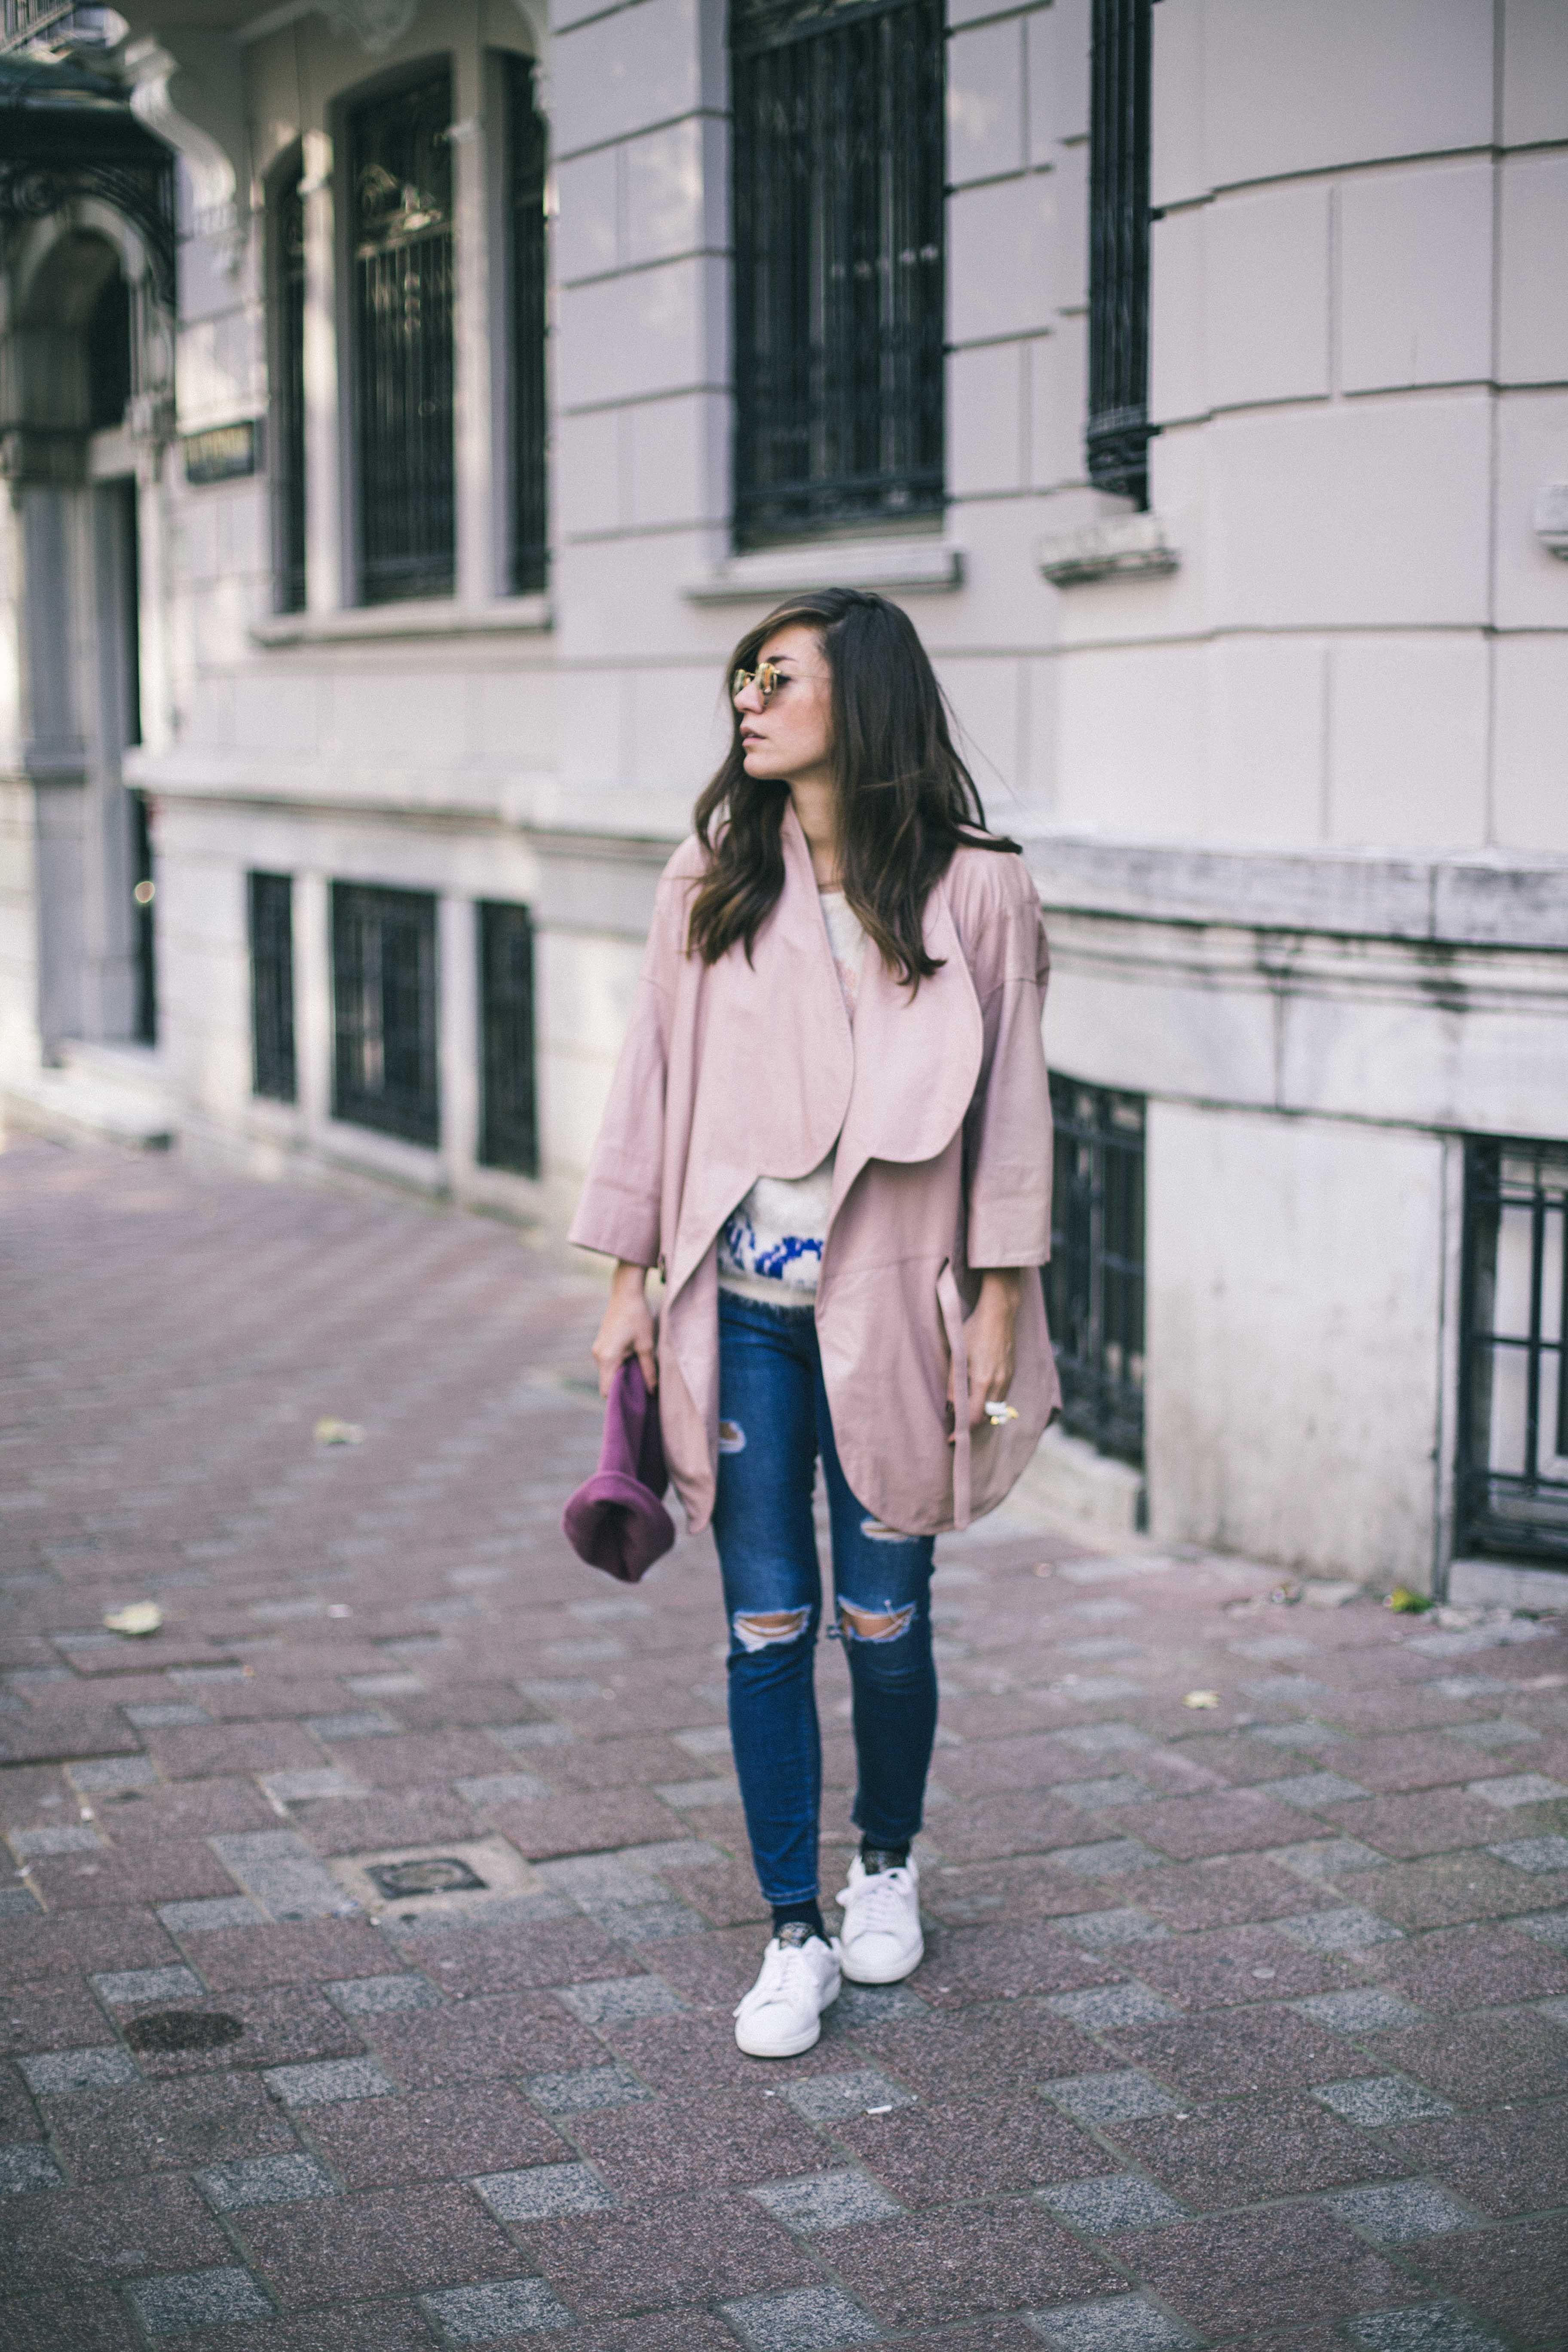 billur saatci, offnegiysem, turkish style blogger, street style, fashion, ootd, blogger, istanbul, bashaques, pink, leather jacket, rayban, zespa aix-en-provence